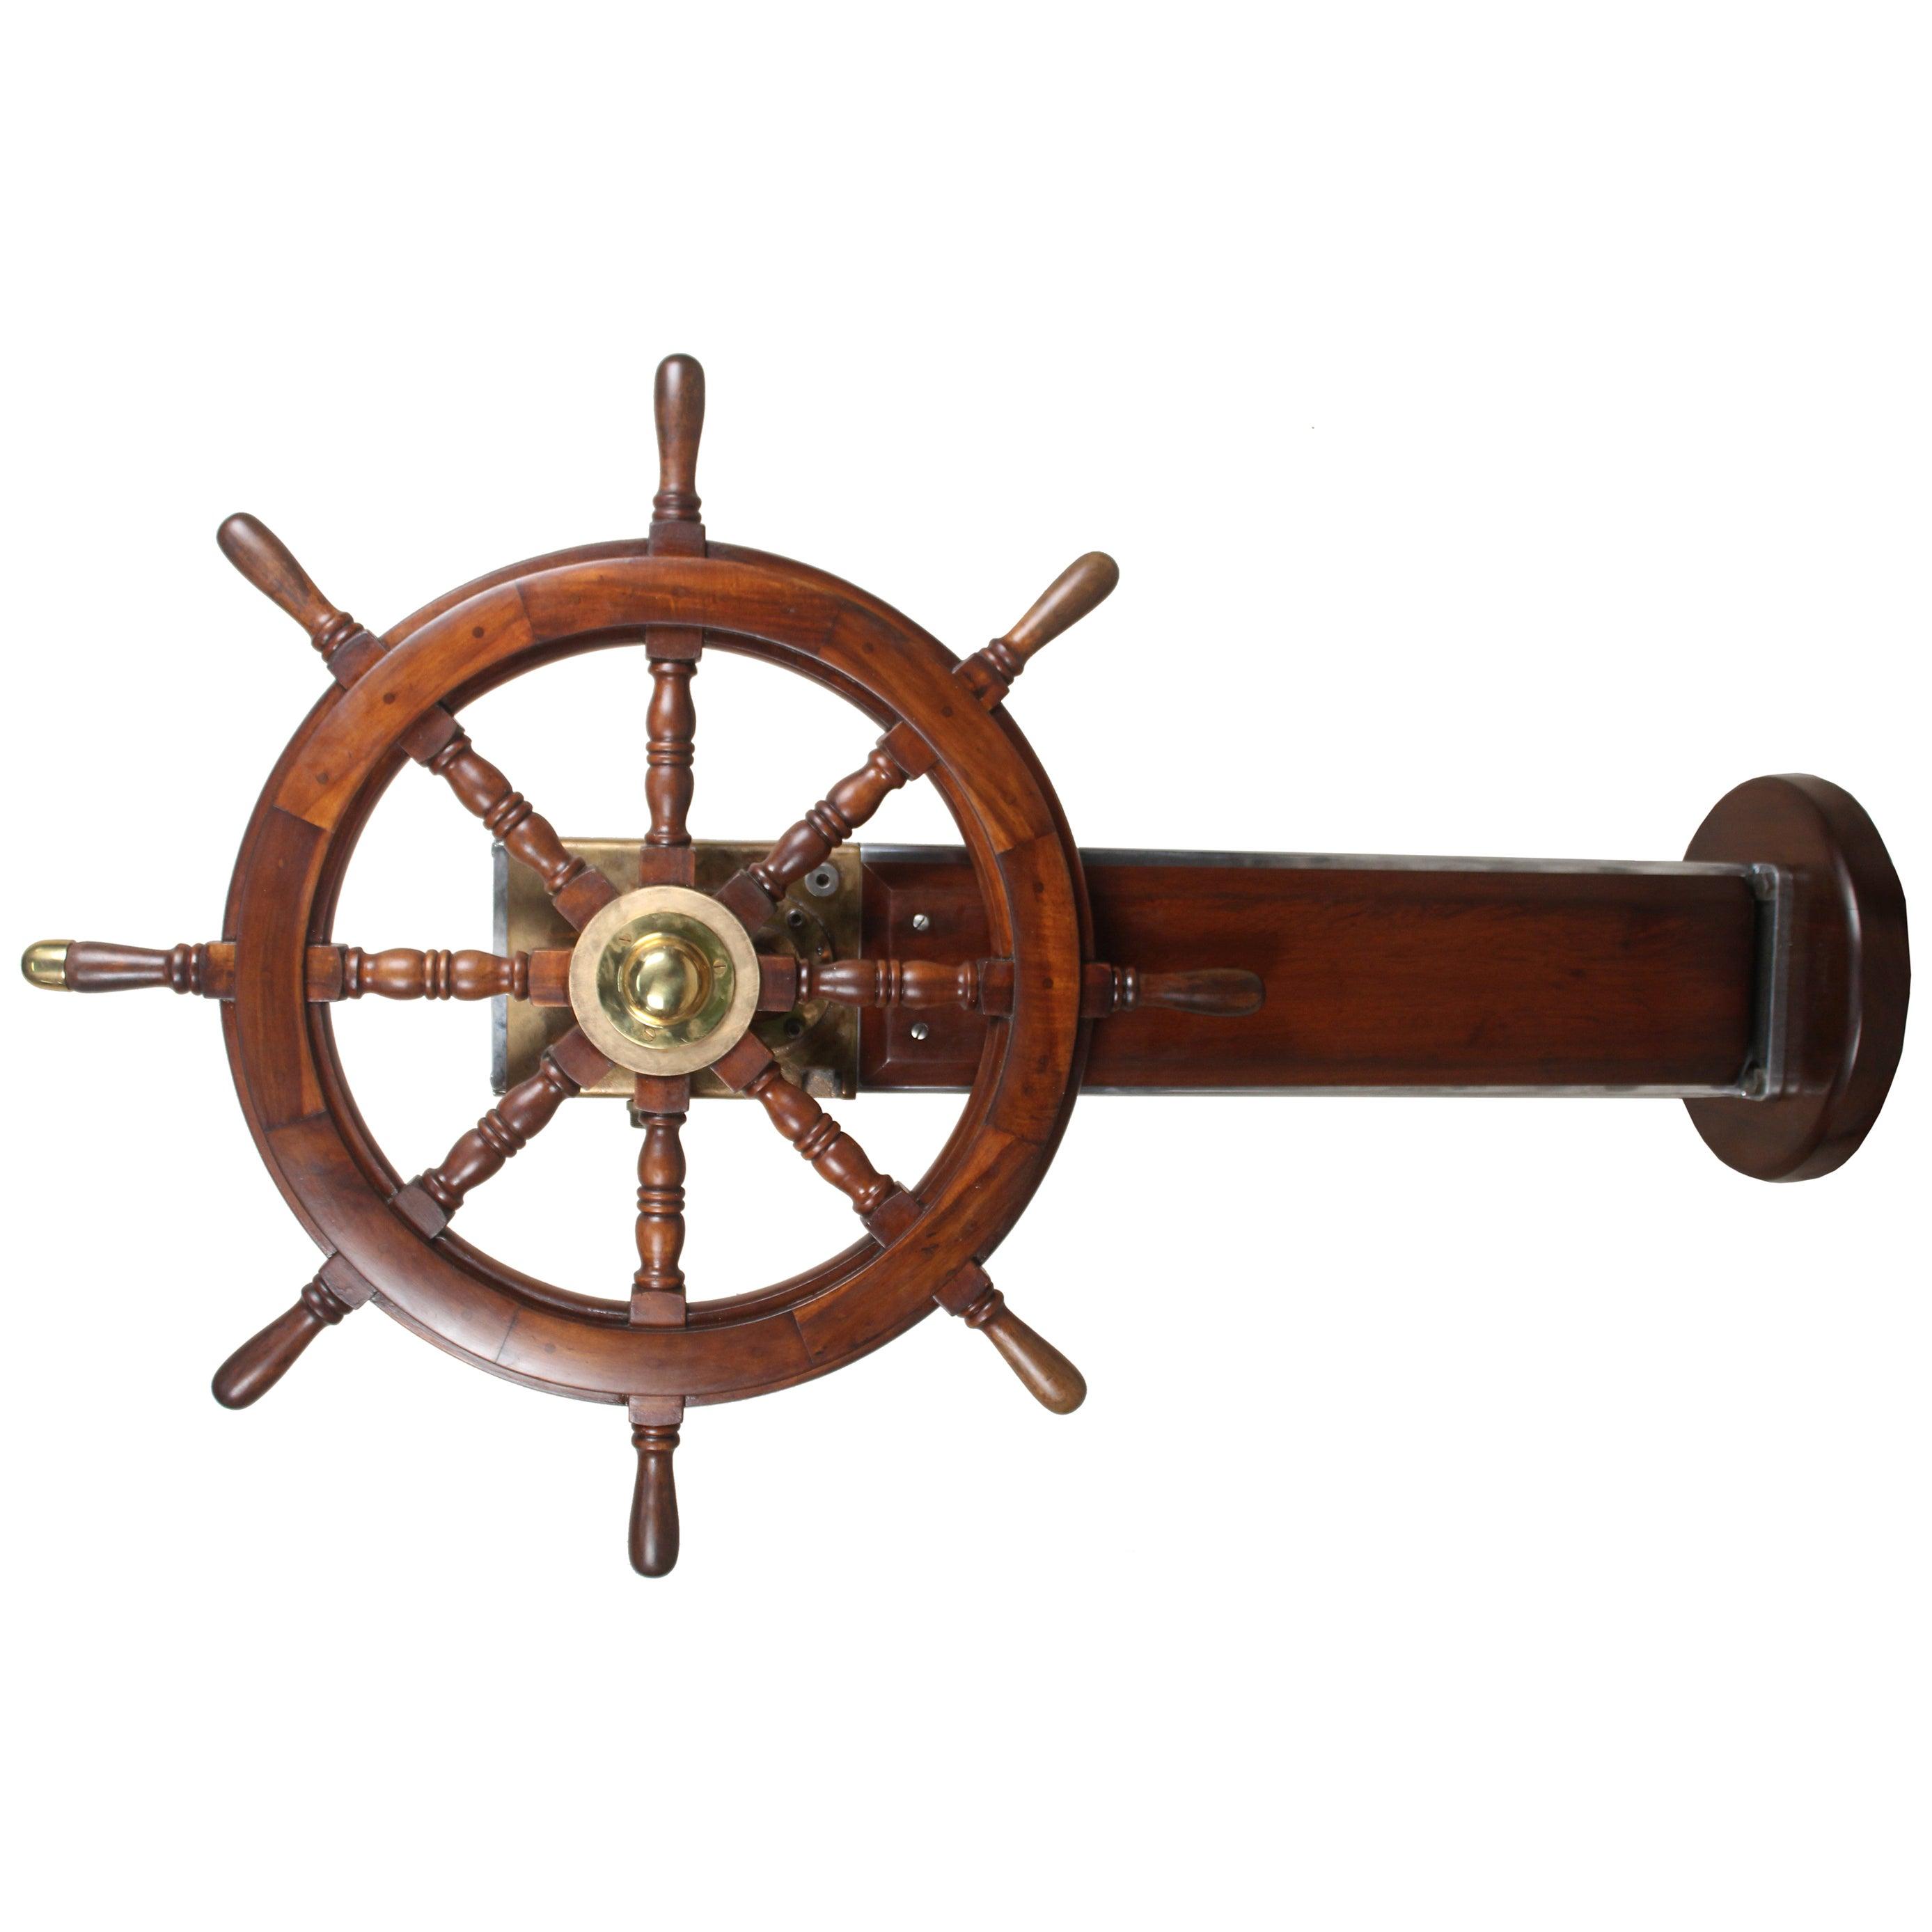 Brass, Chrome and Teak Steering Column and Wheel, Norwegian, Midcentury